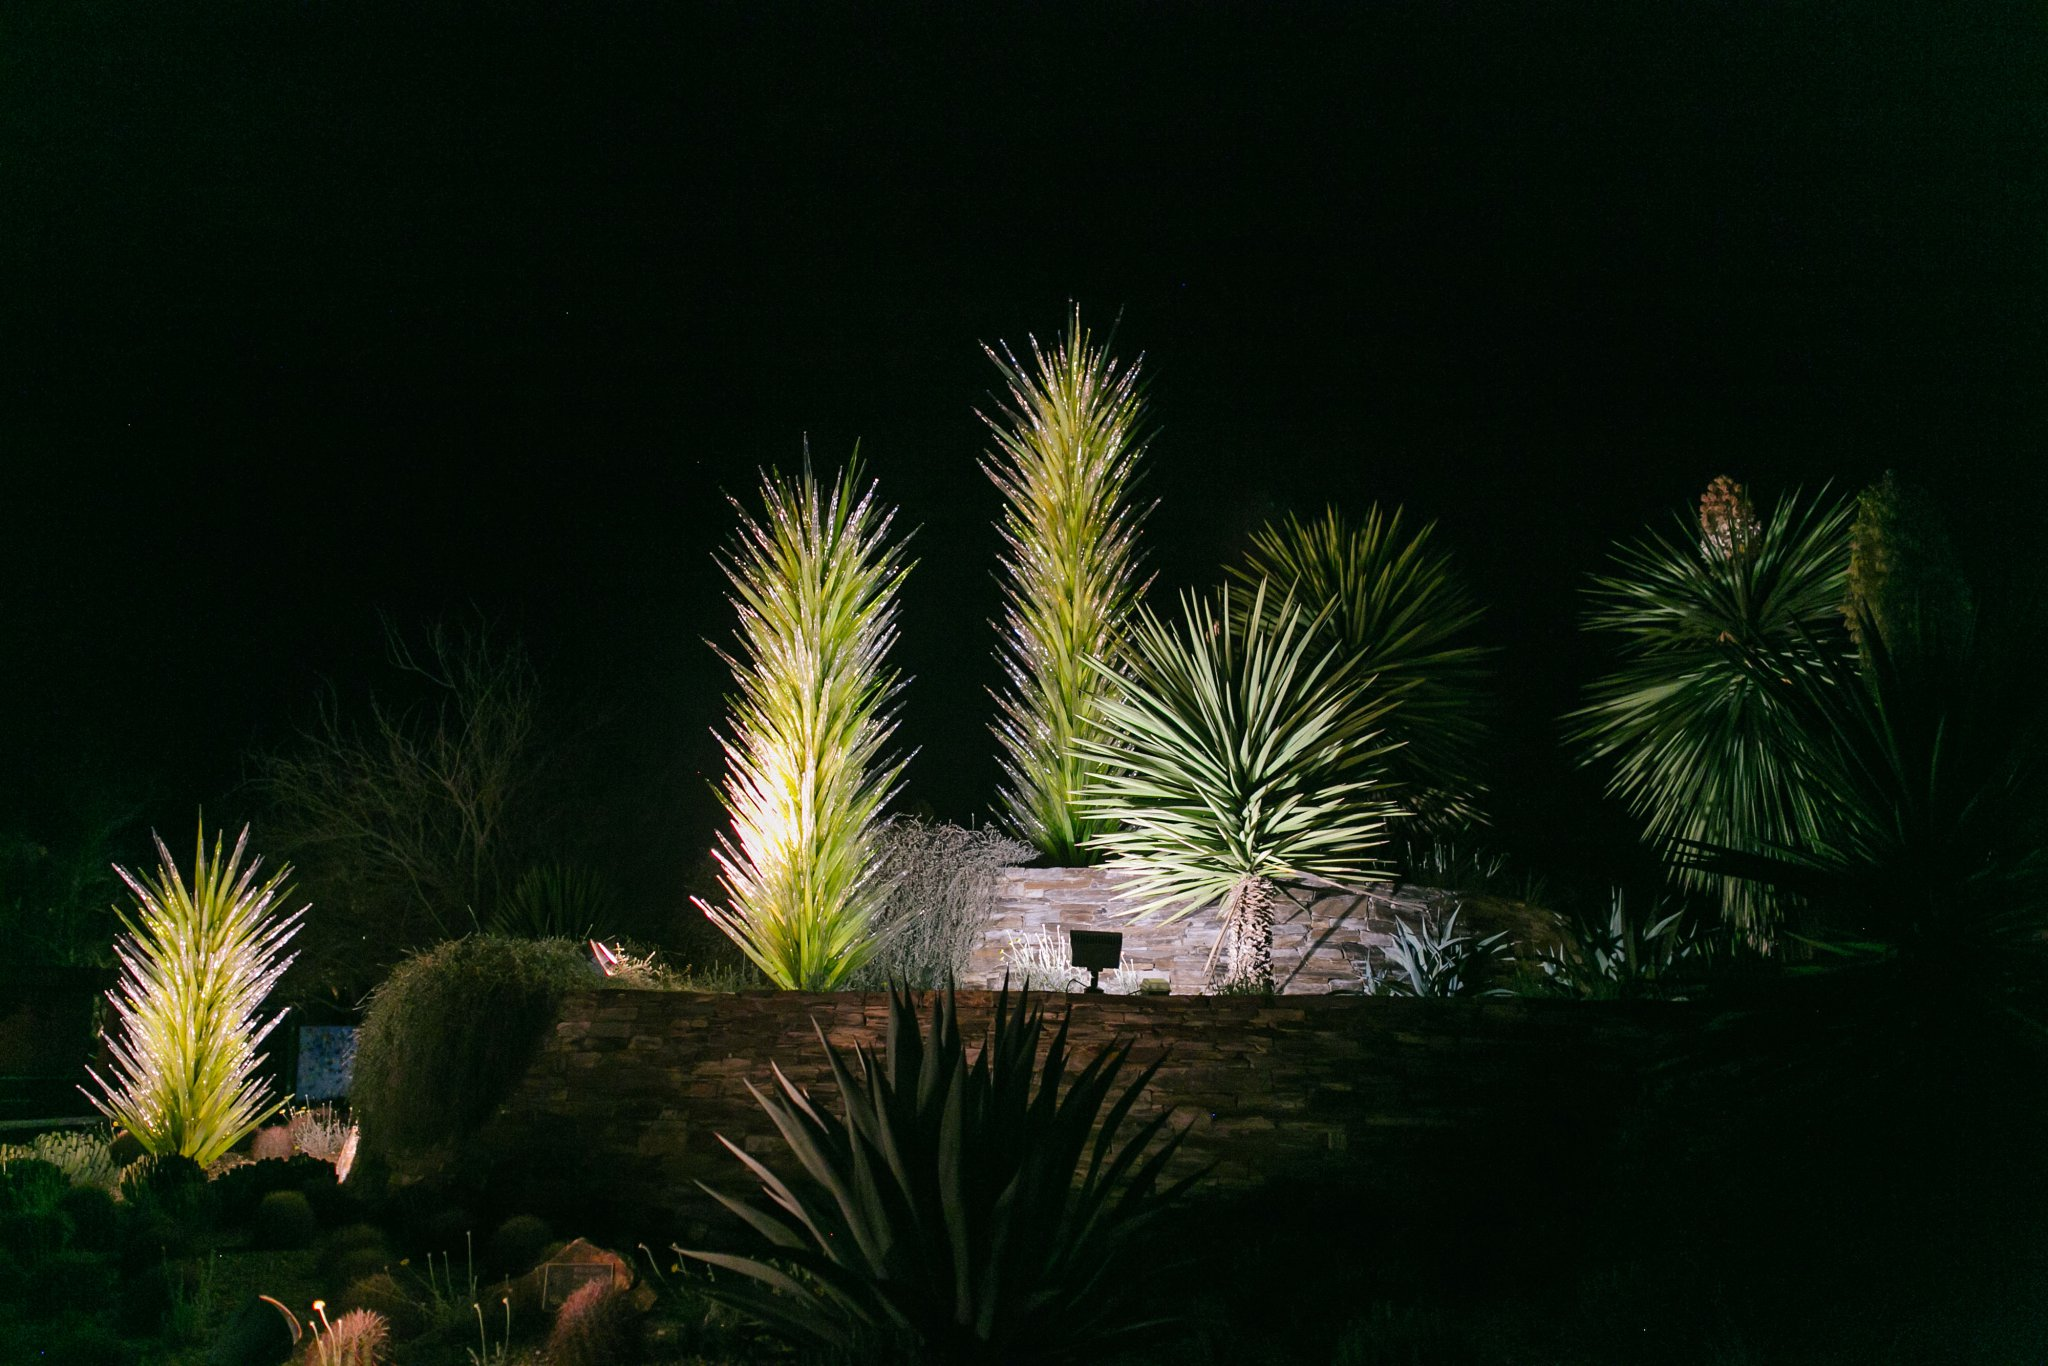 Desert Botanical Gardens chihuly at night